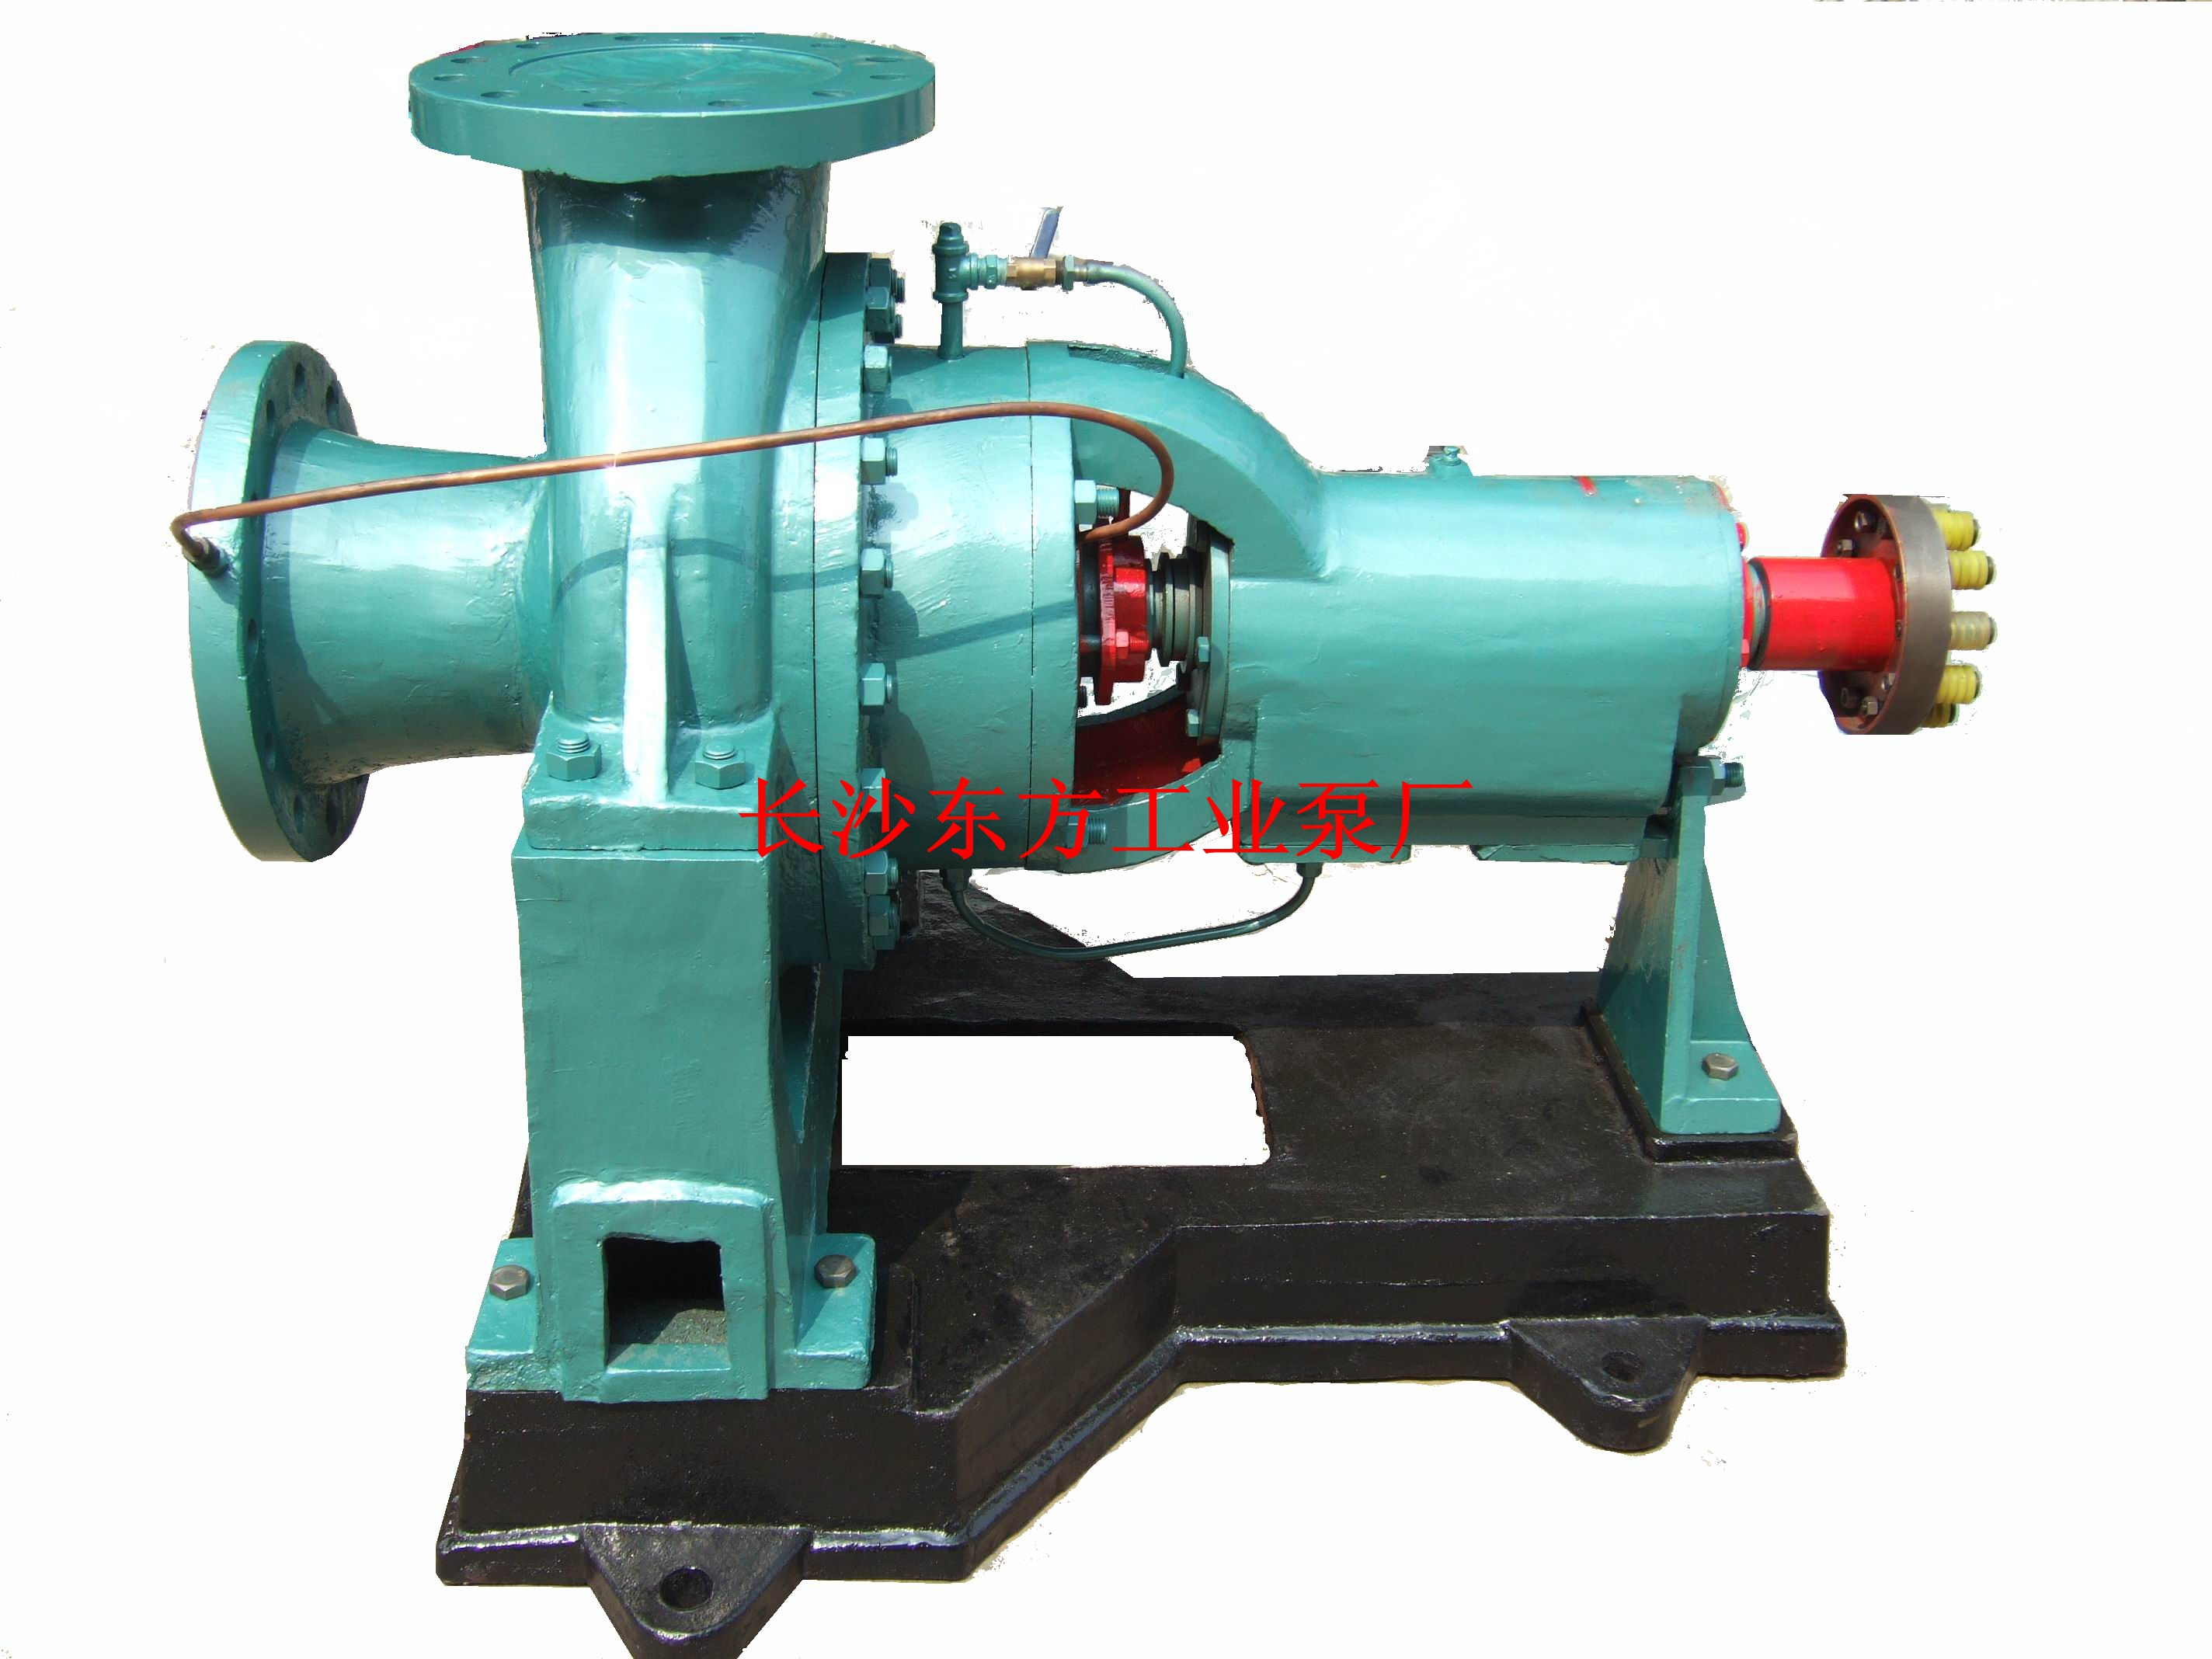 40R-26I单级单吸热水循环泵